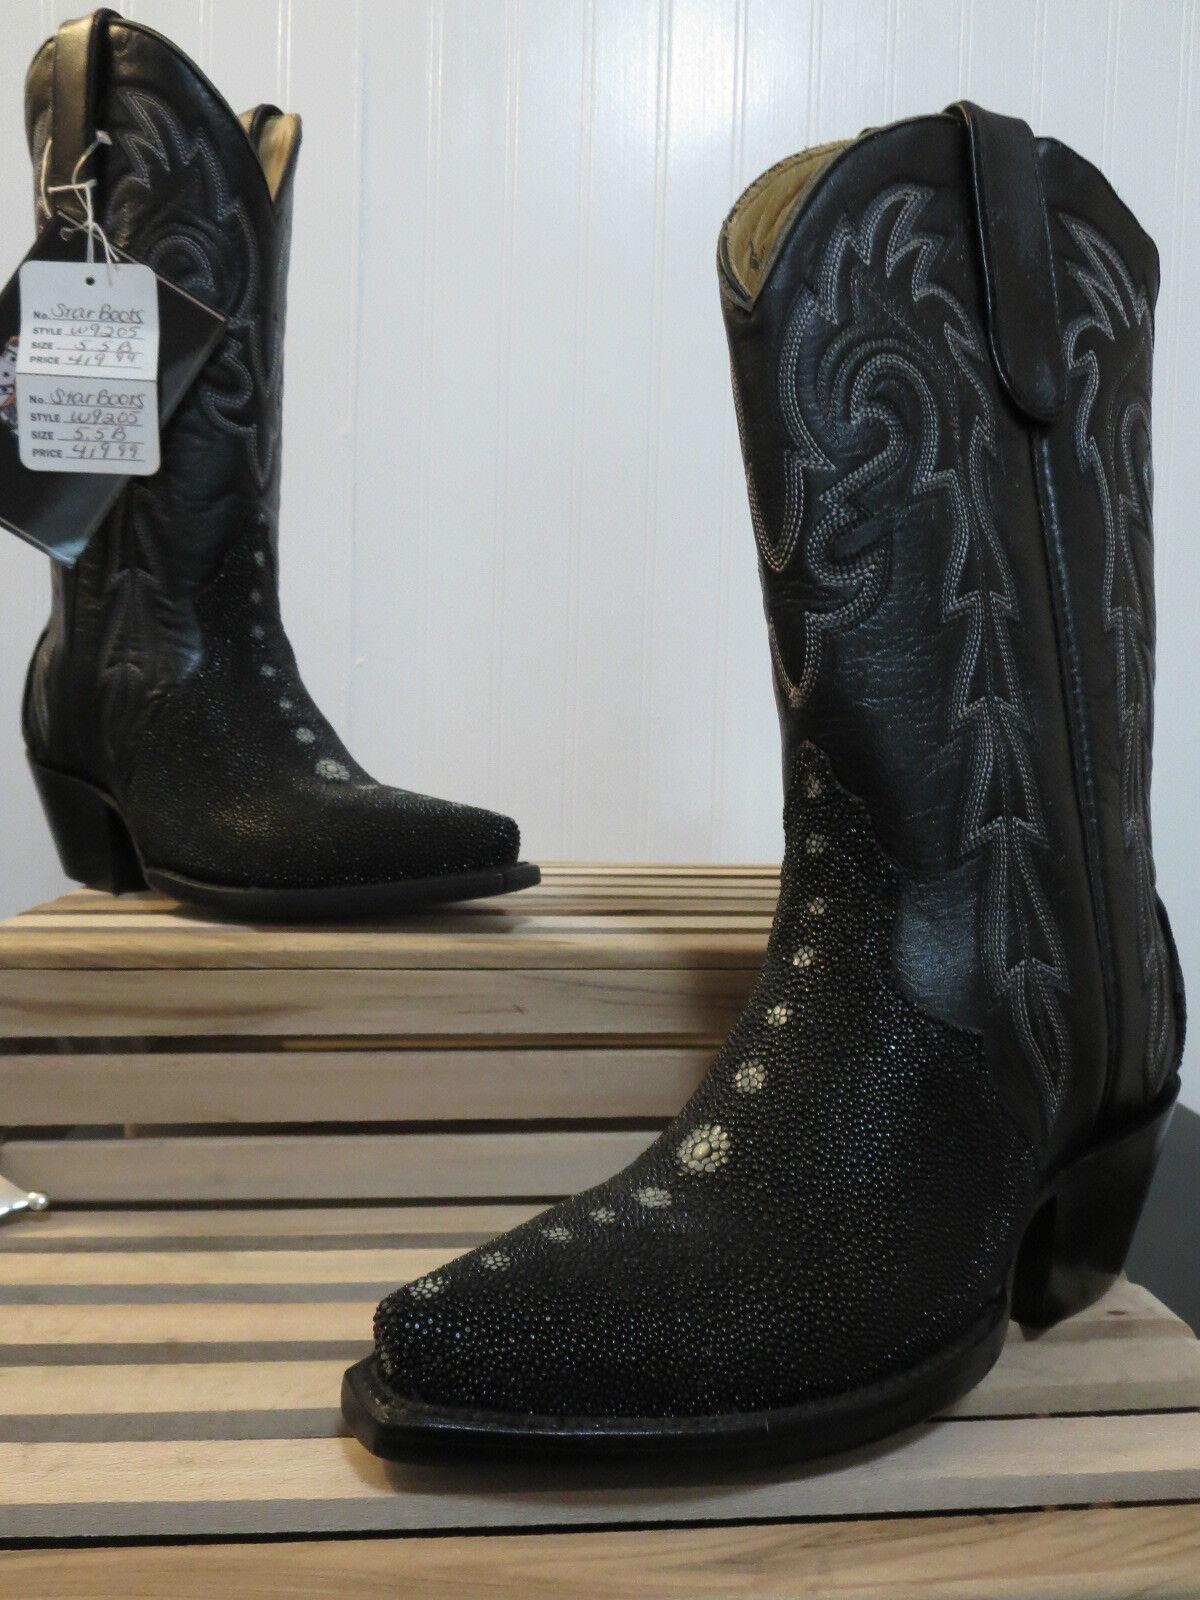 Star Boots Women's Black Stingray Triad Boot W9205 Size 5.5 B, NEW